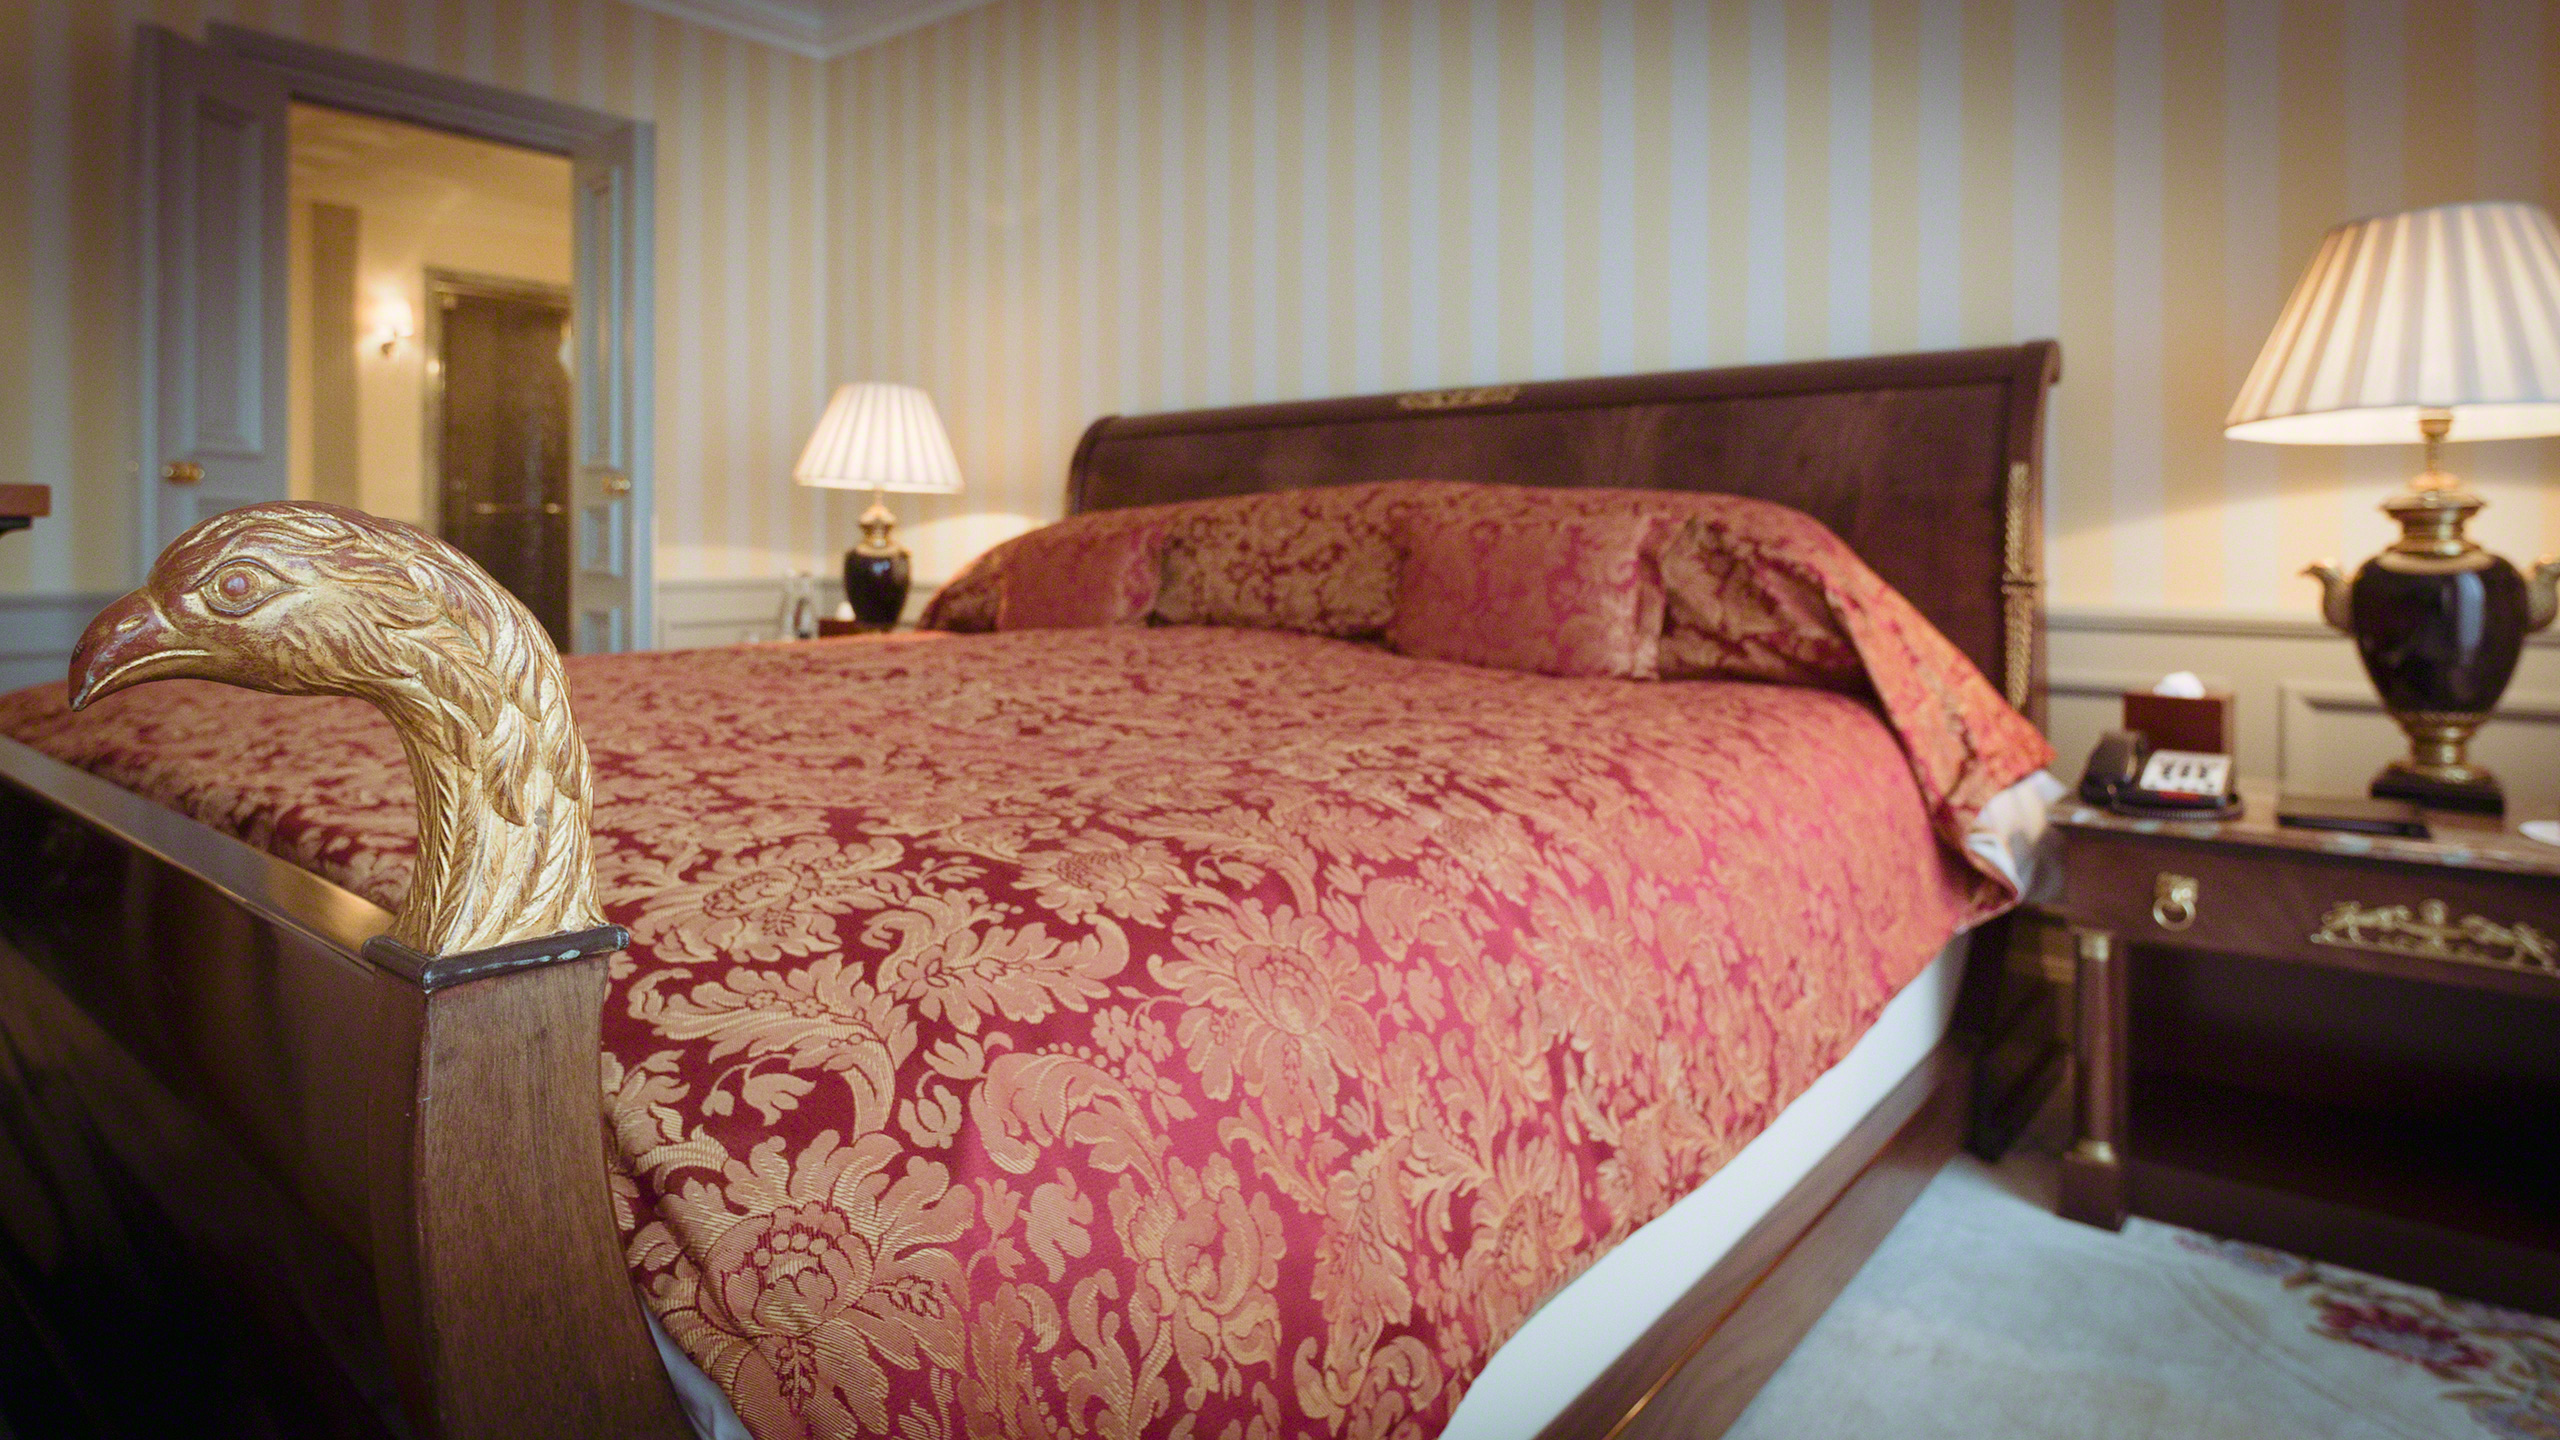 Luxushotel Adlon Kempinski Berlin Royal Suite Königs Bett